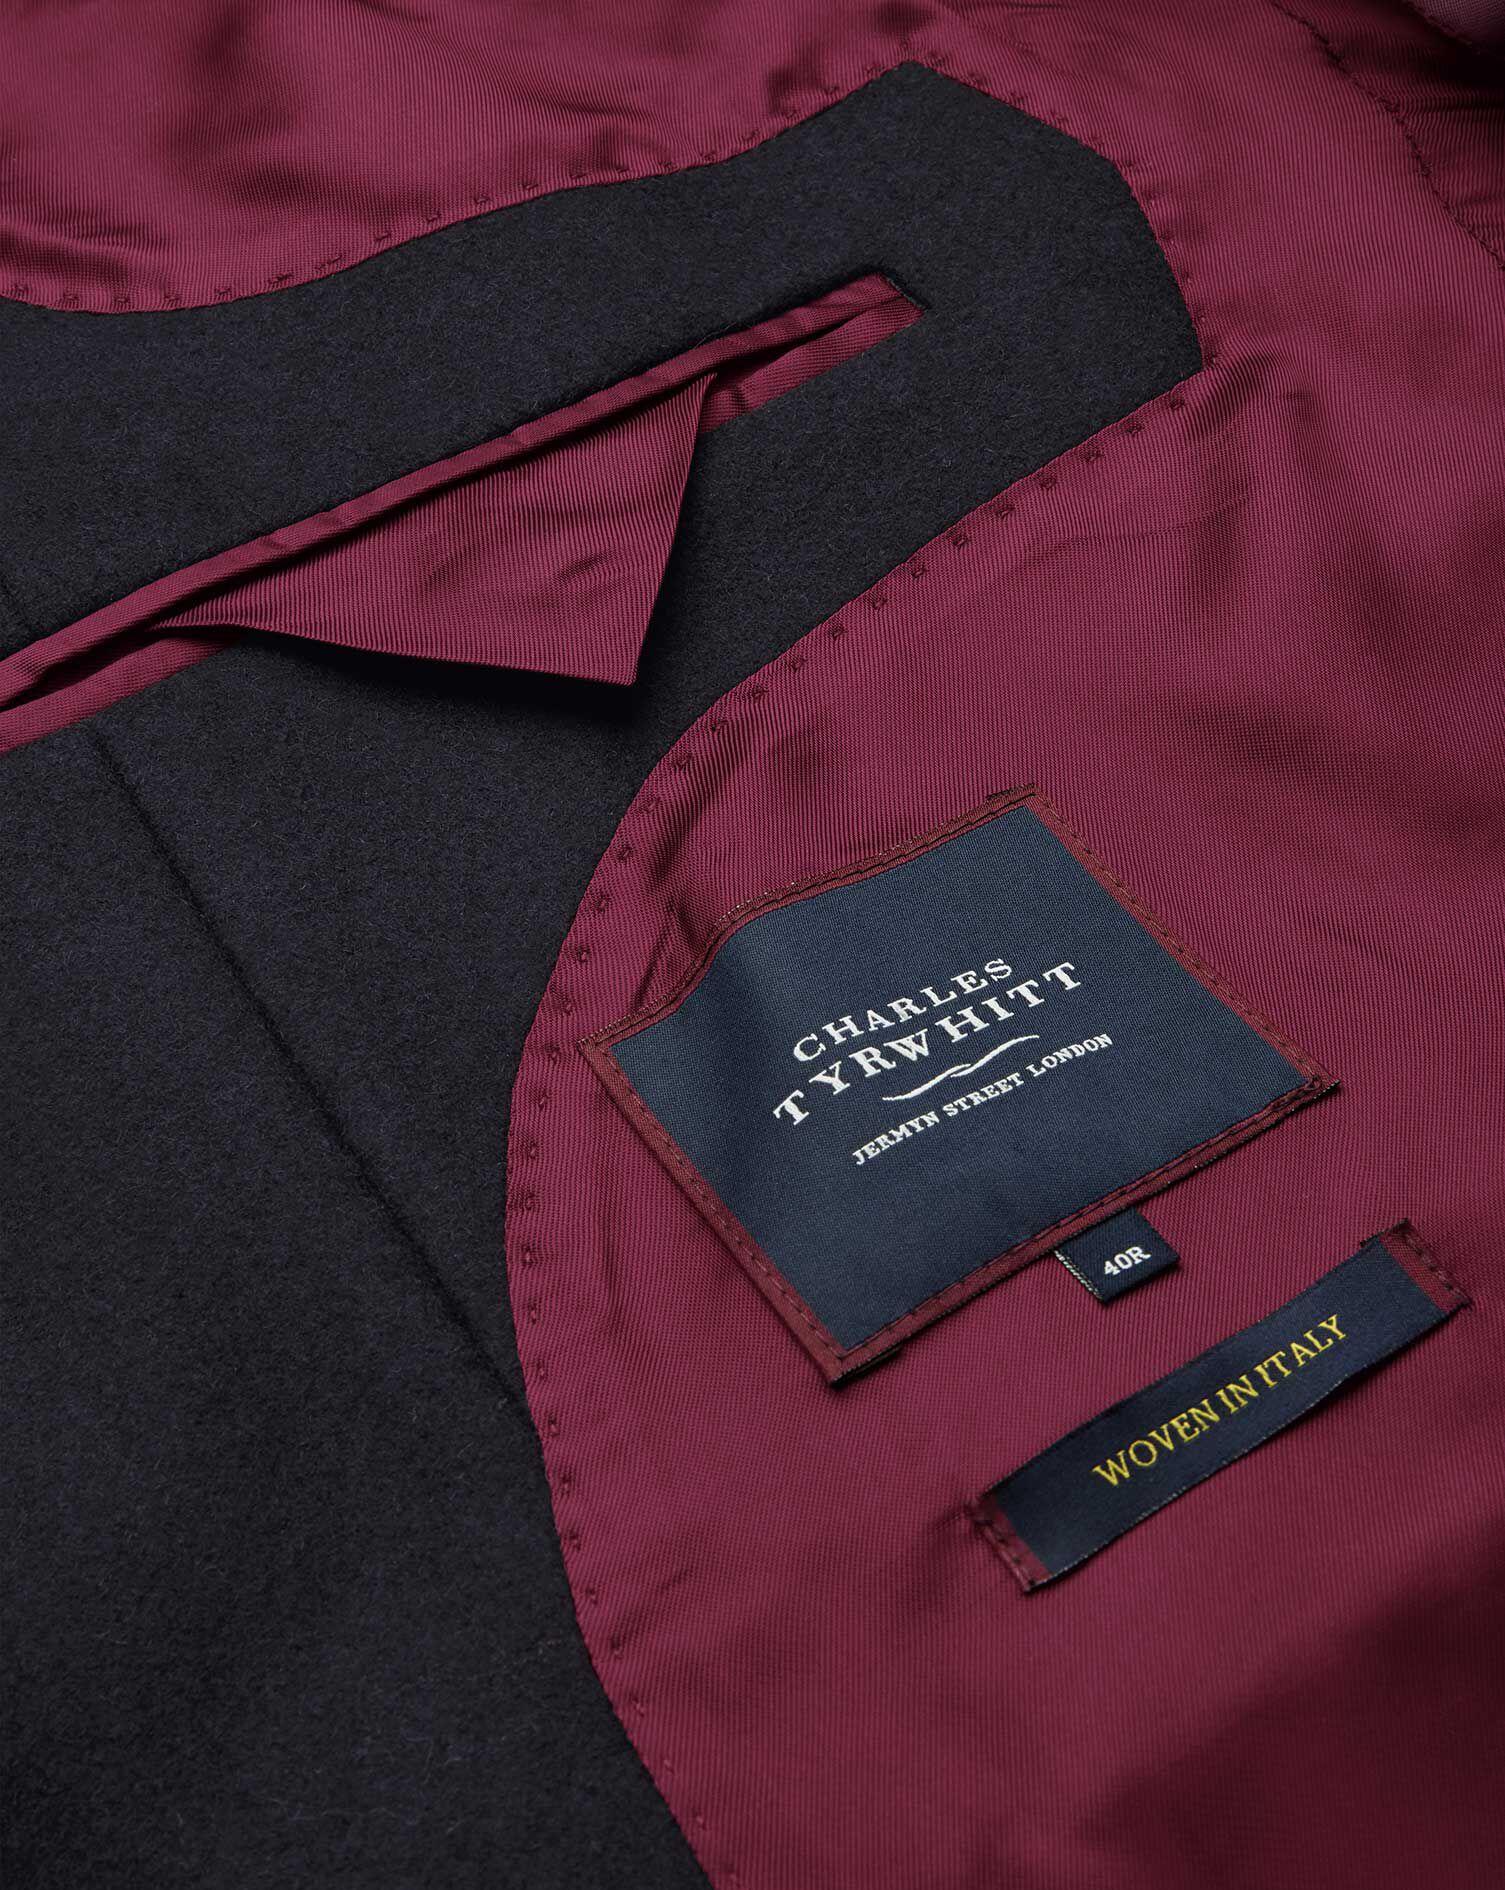 Deckkaro mit Mantel in Epsom aus Marineblau Wolle c34RqAjL5